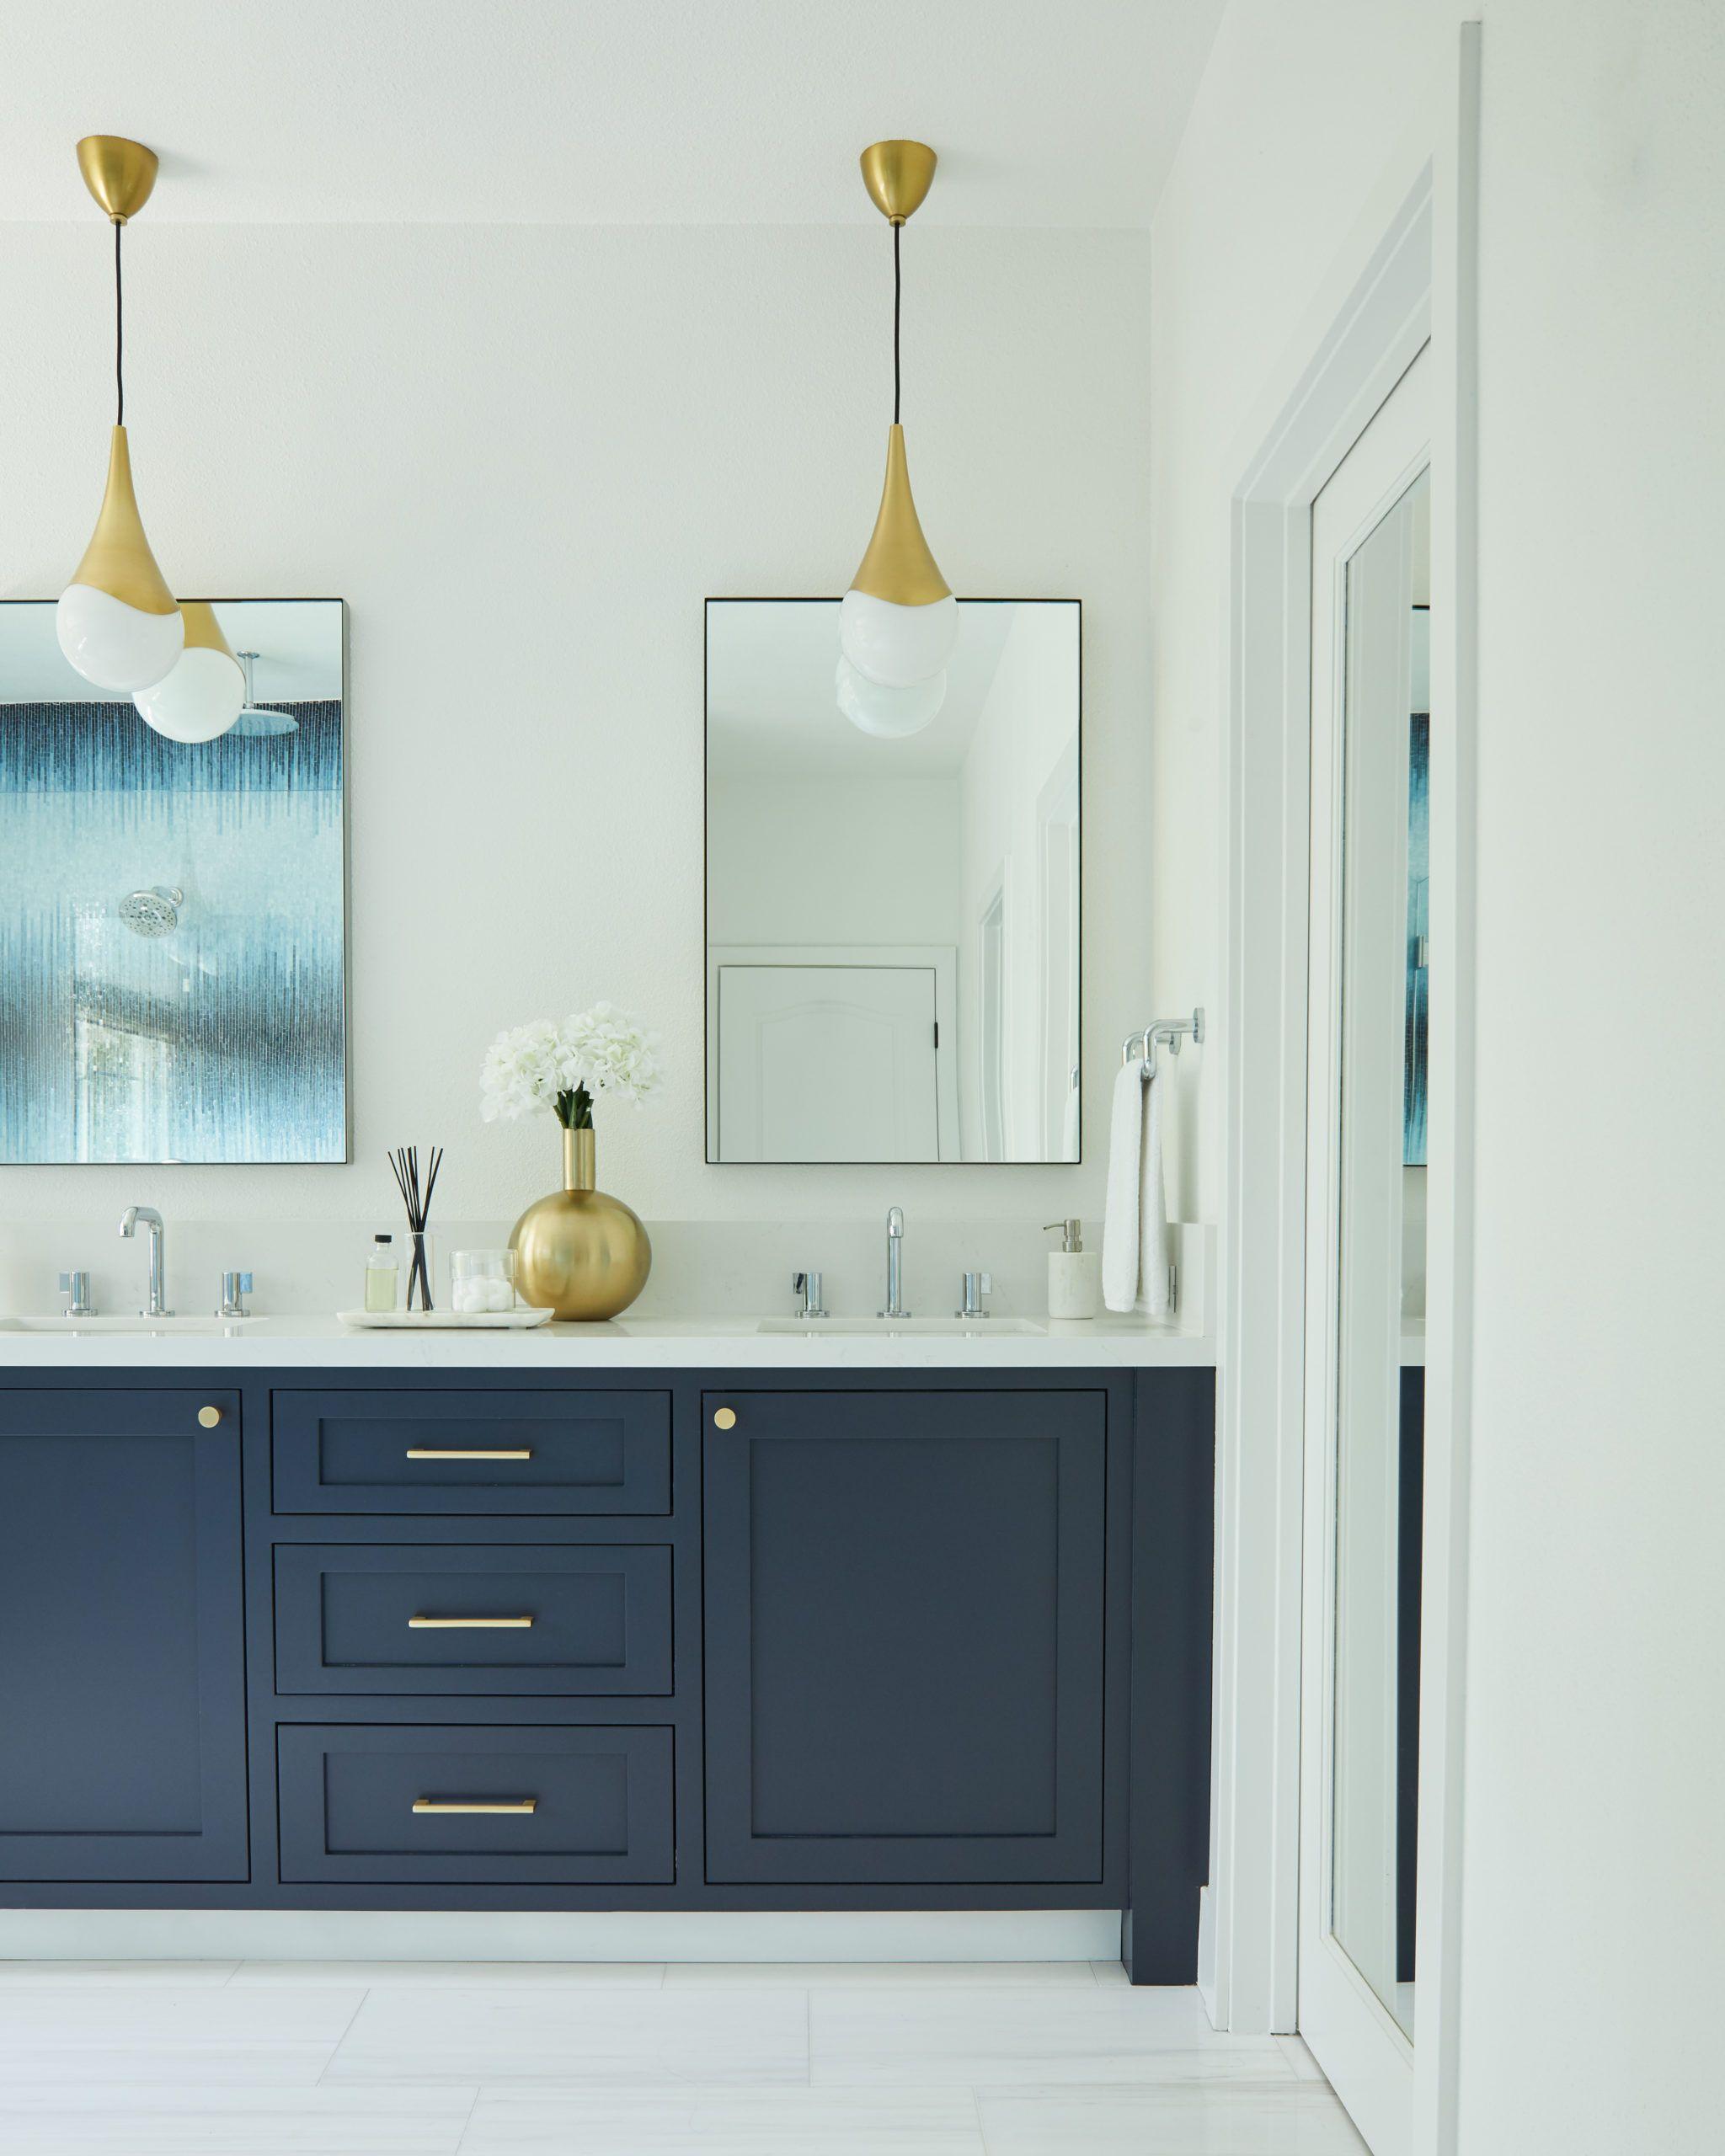 Porter Ranch - ae designs#interiordesign #interiorinspiration #bathroom